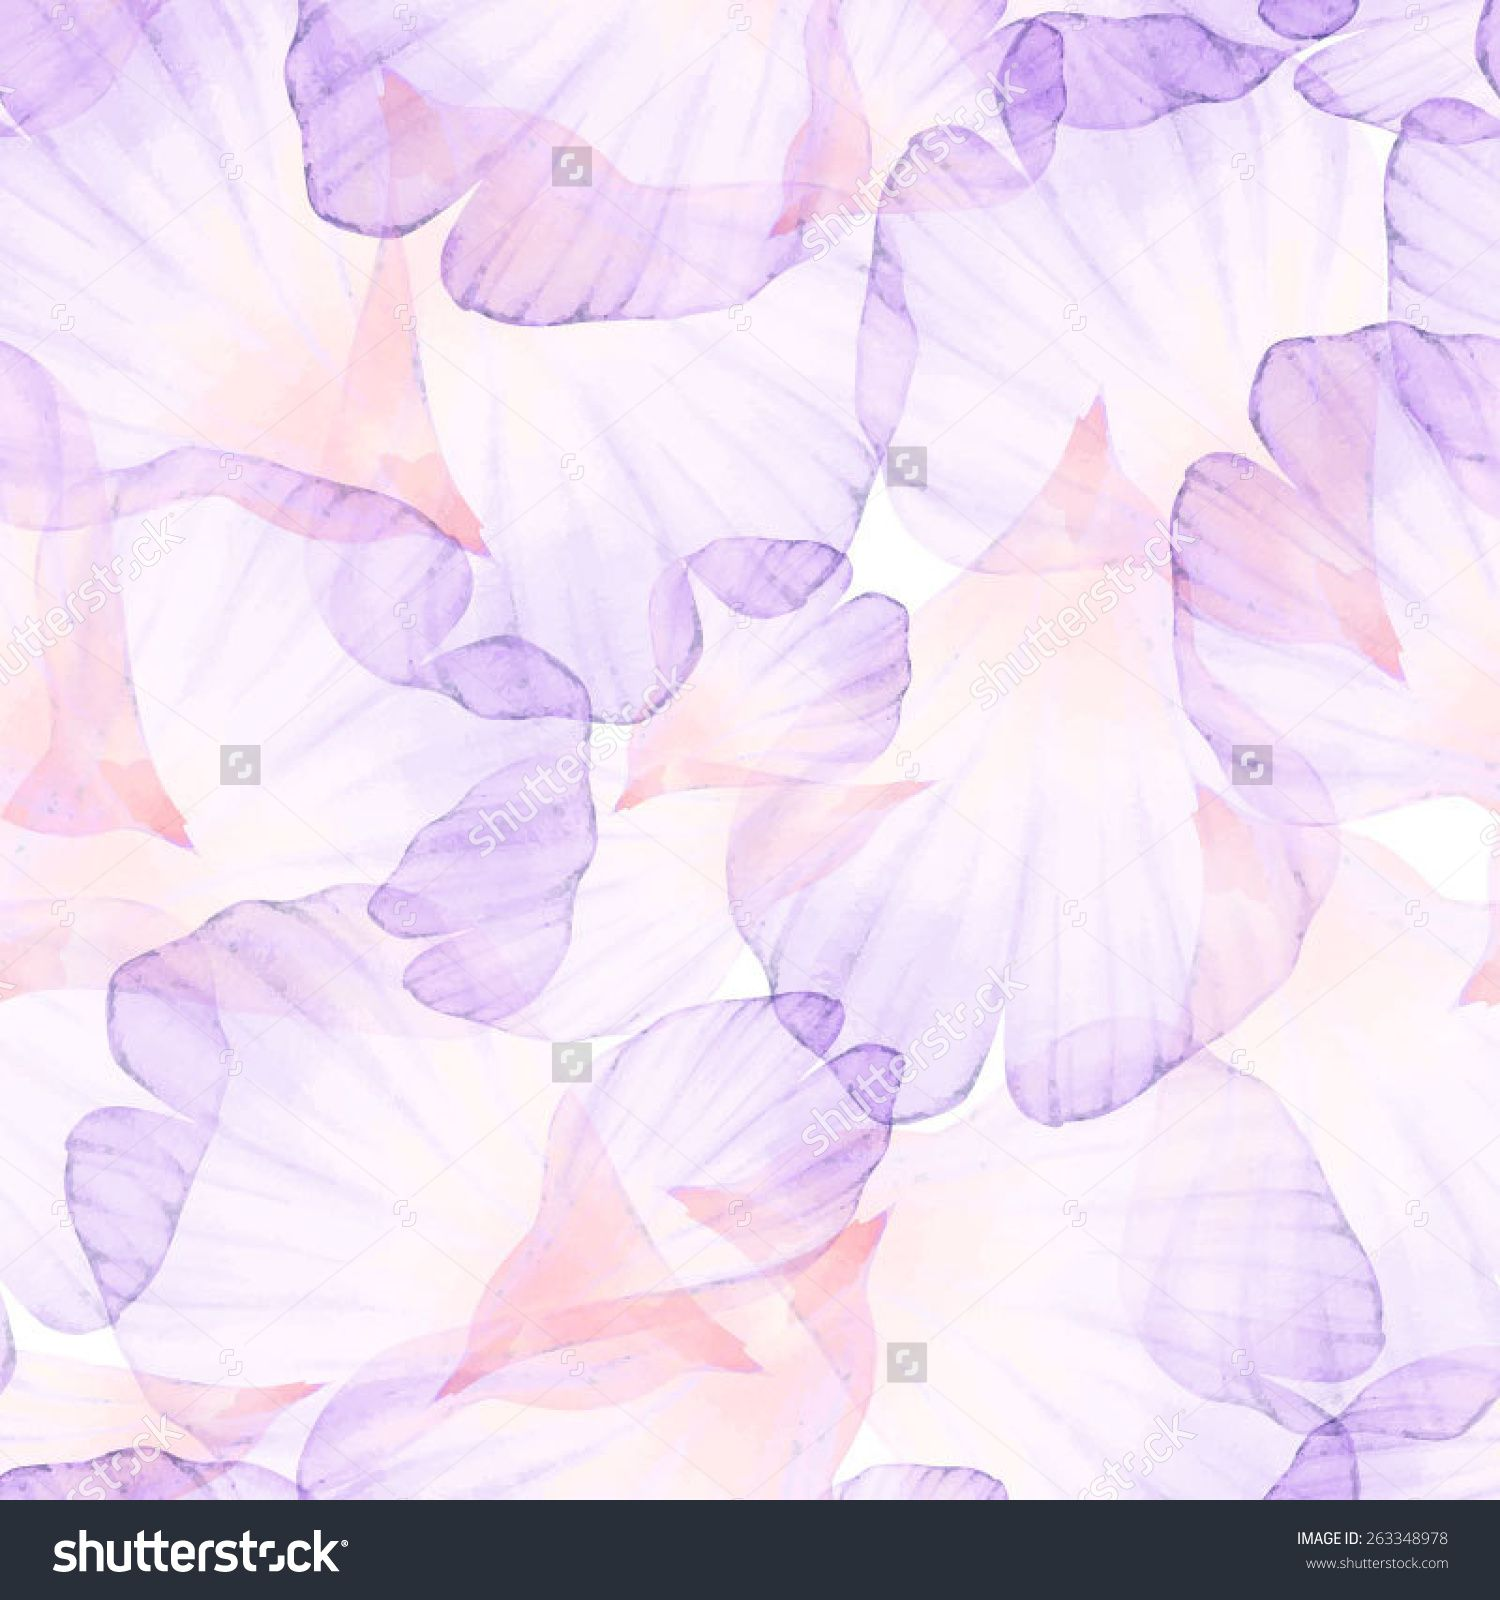 Watercolor Seamless Pattern Pink Flower Petal Vectorized